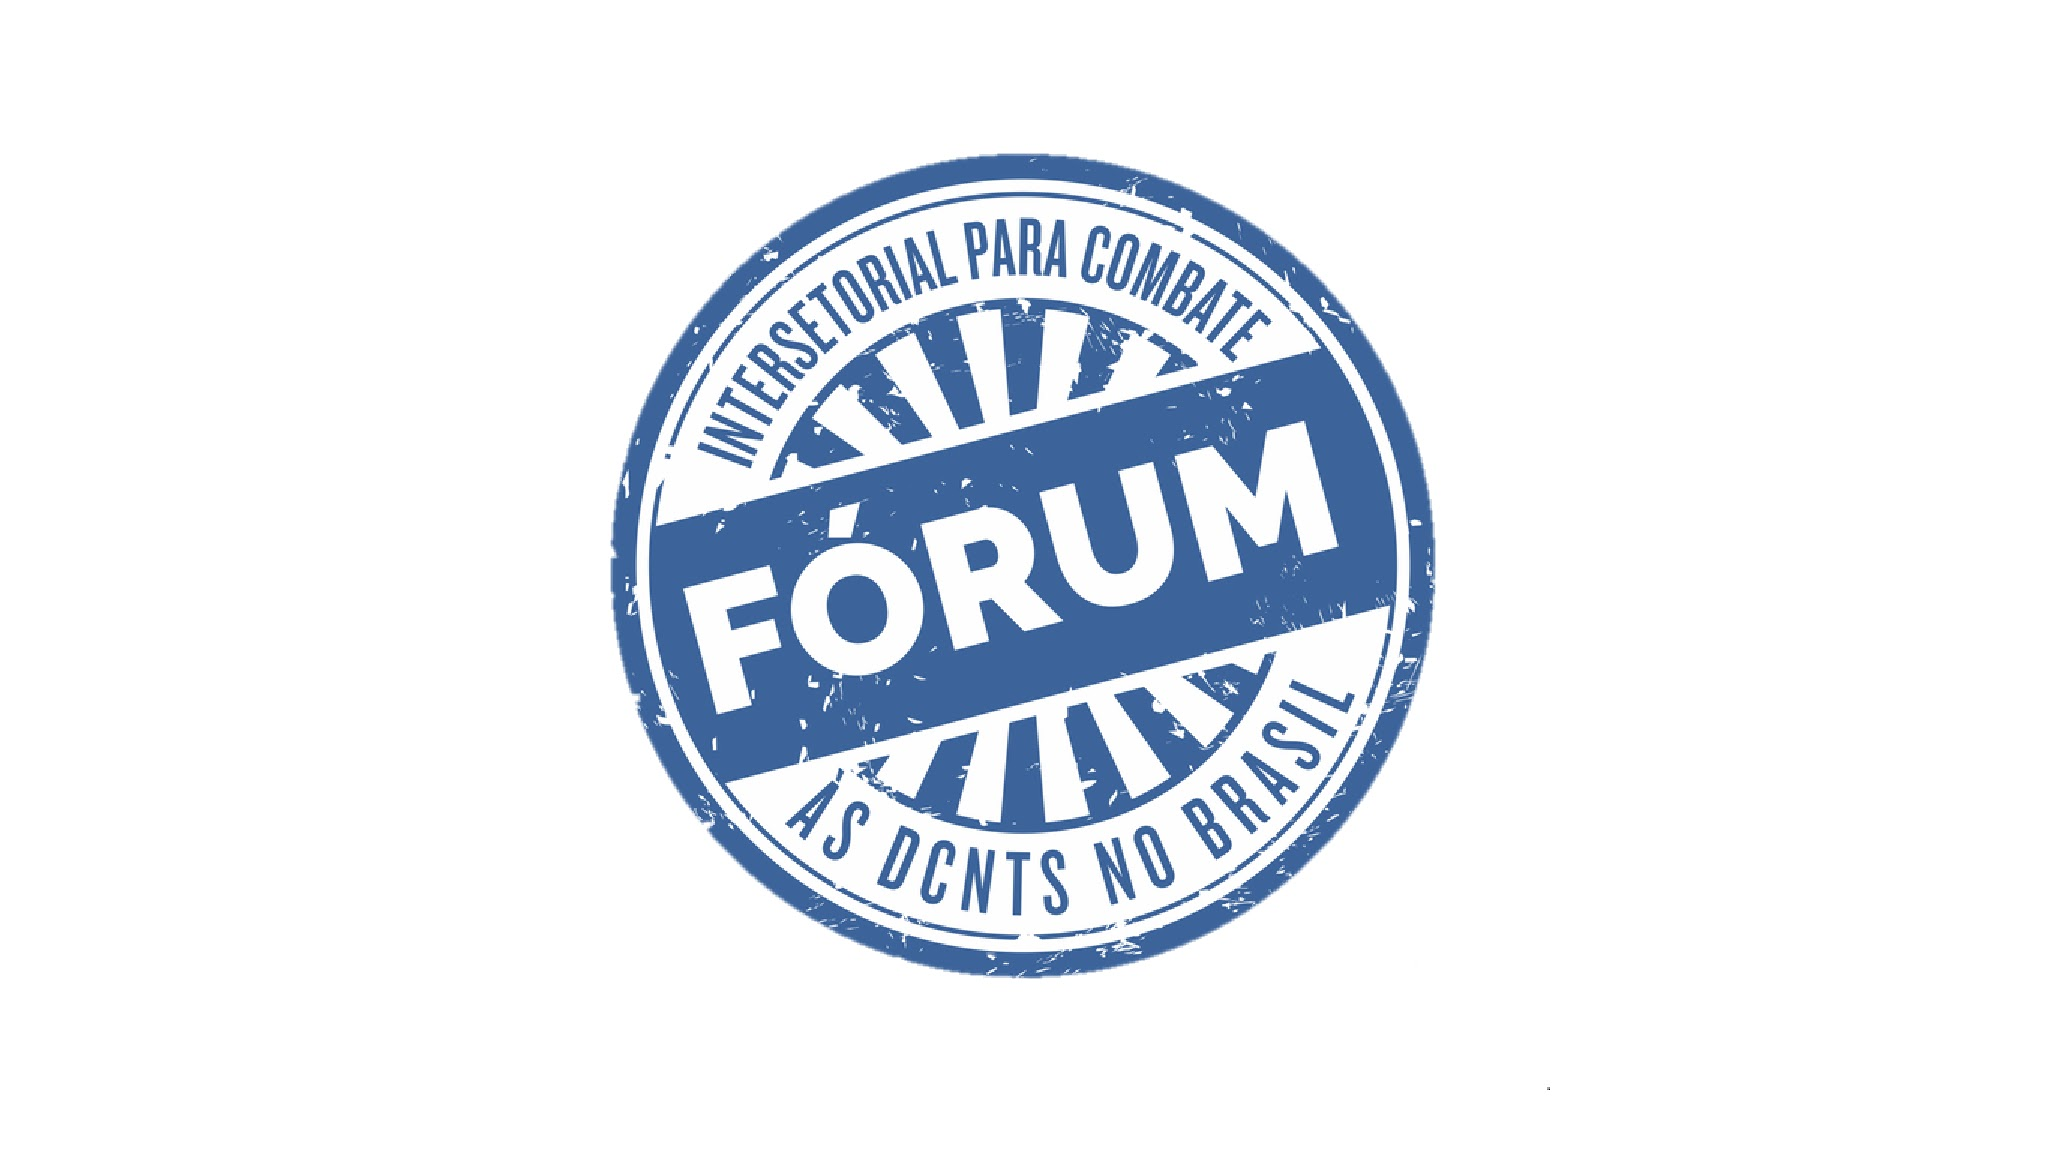 Fórum Intersetorial Para Combate às DCNTs no Brasil